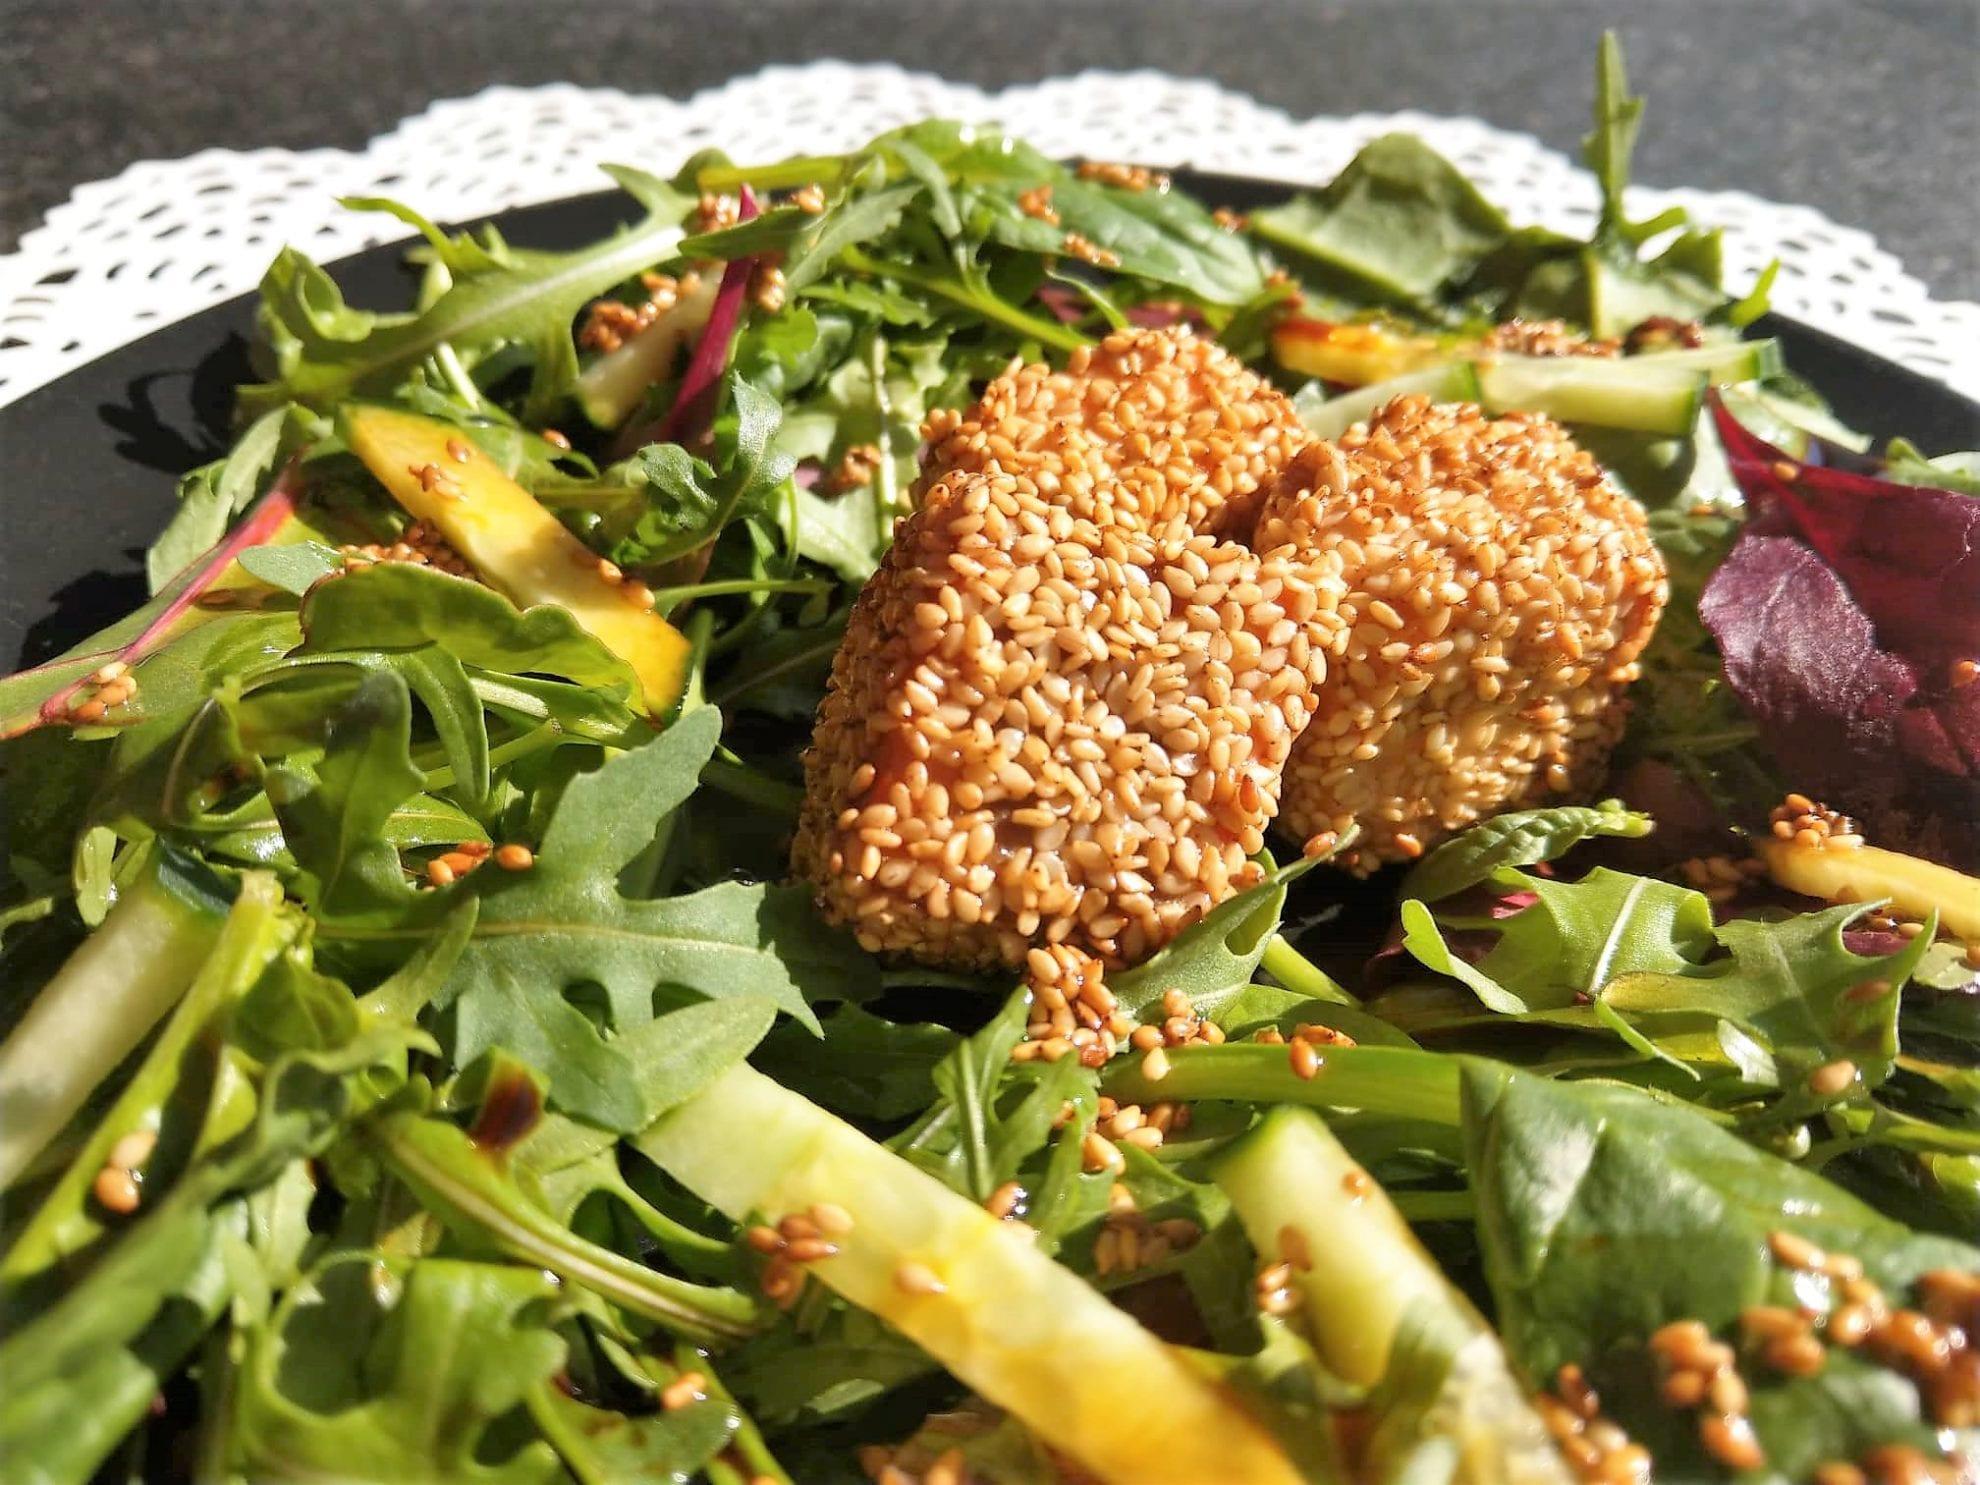 Escal Seafood, Kooperation, Lachs in Sesamkruste, Rezept, Food